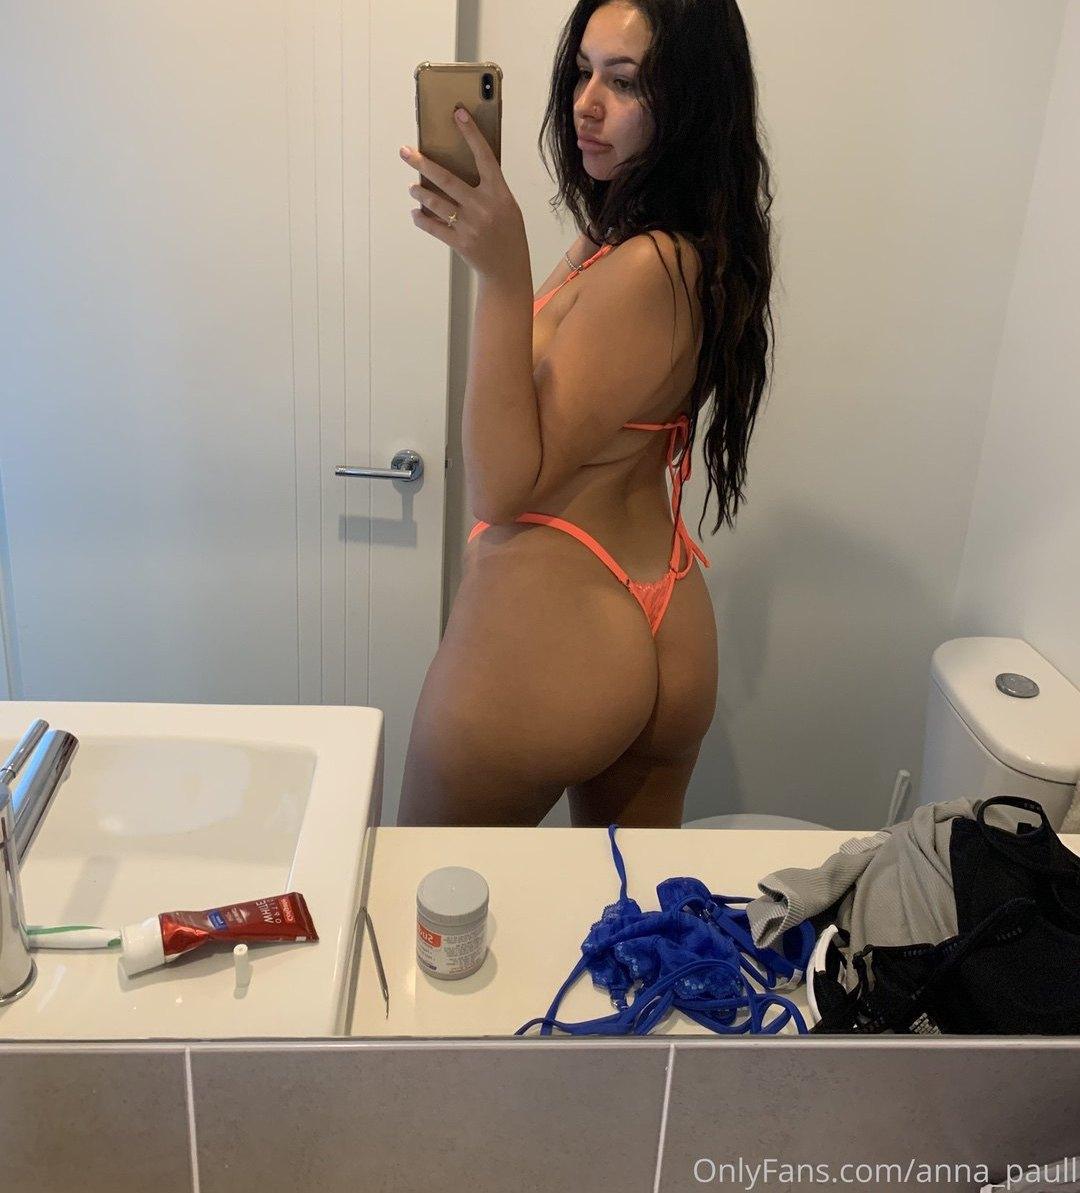 Anna Paul Anna Paull Onlyfans Nudes Leaks 0027